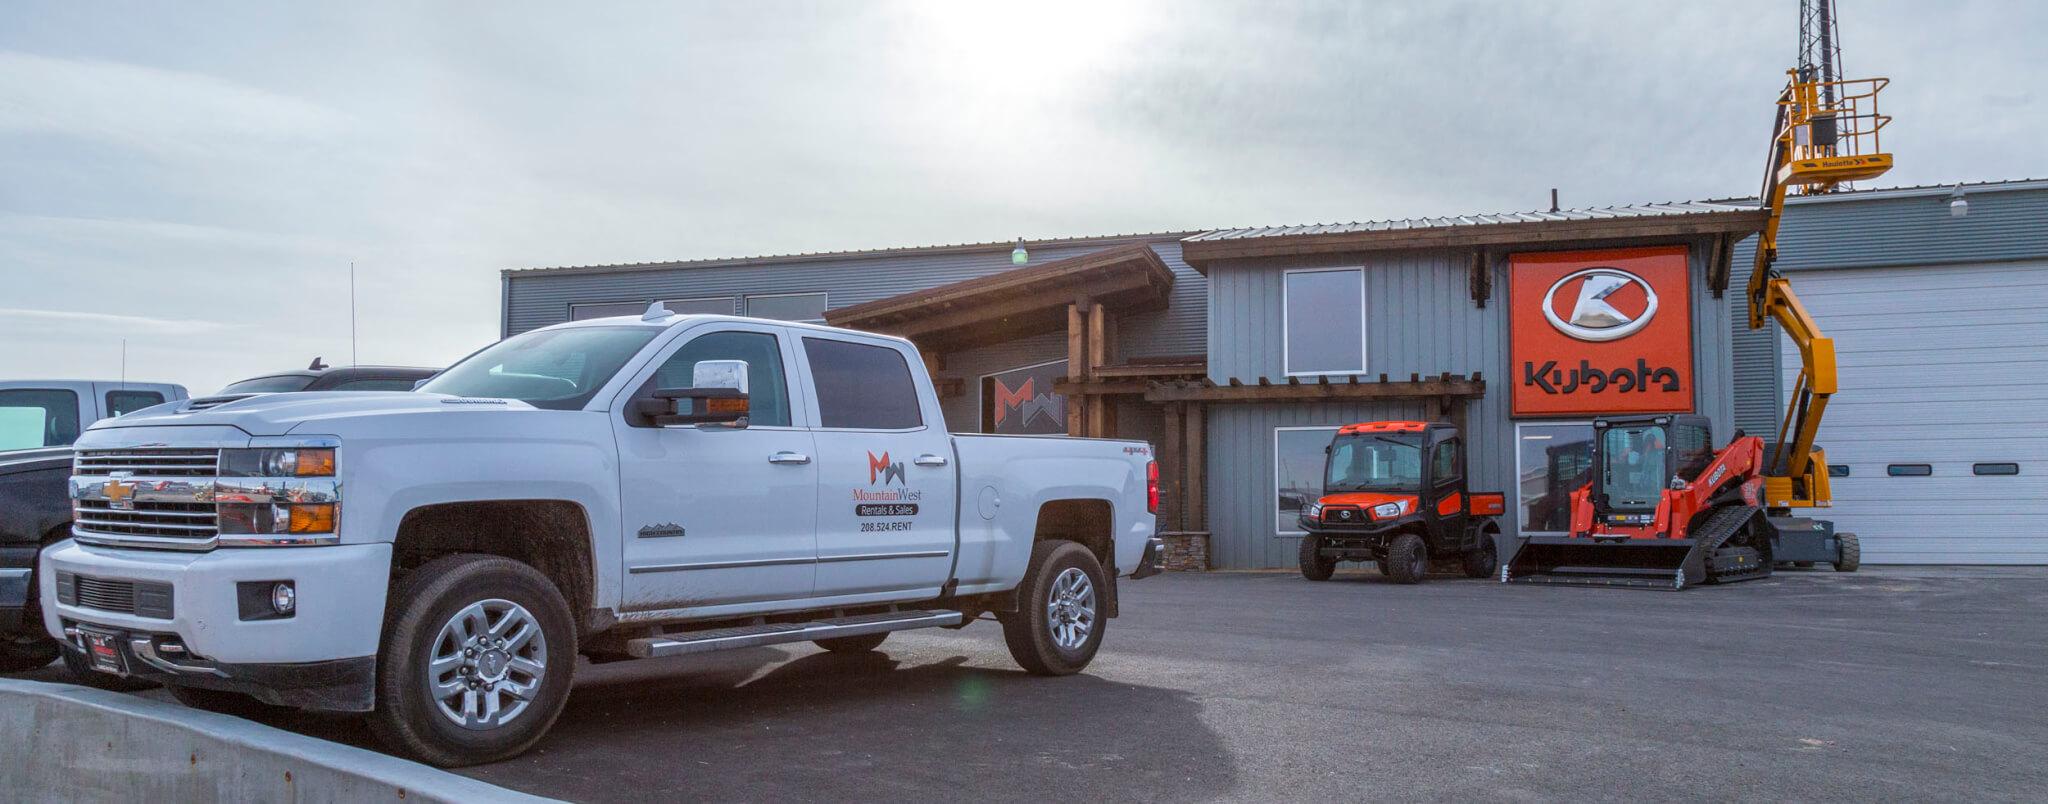 Idaho Falls Rental Equipment   Mountain West Rentals & Sales